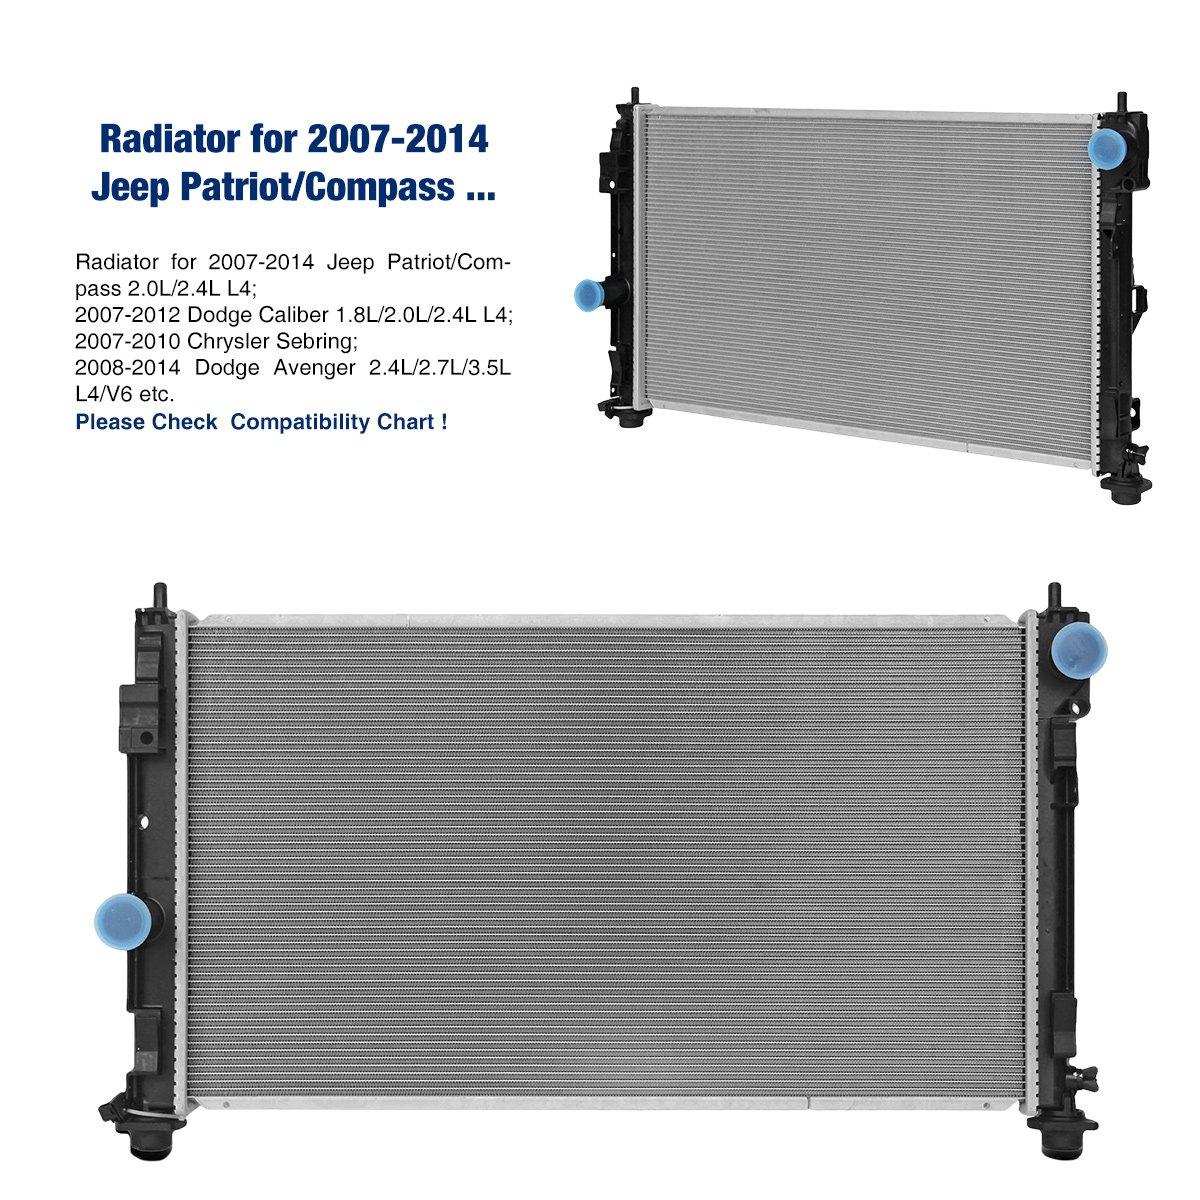 Jeep Patriot Fuse Diagram Schematic Diagrams 2013 Subaru Outback 2008 2 4l Custom Wiring U2022 2010